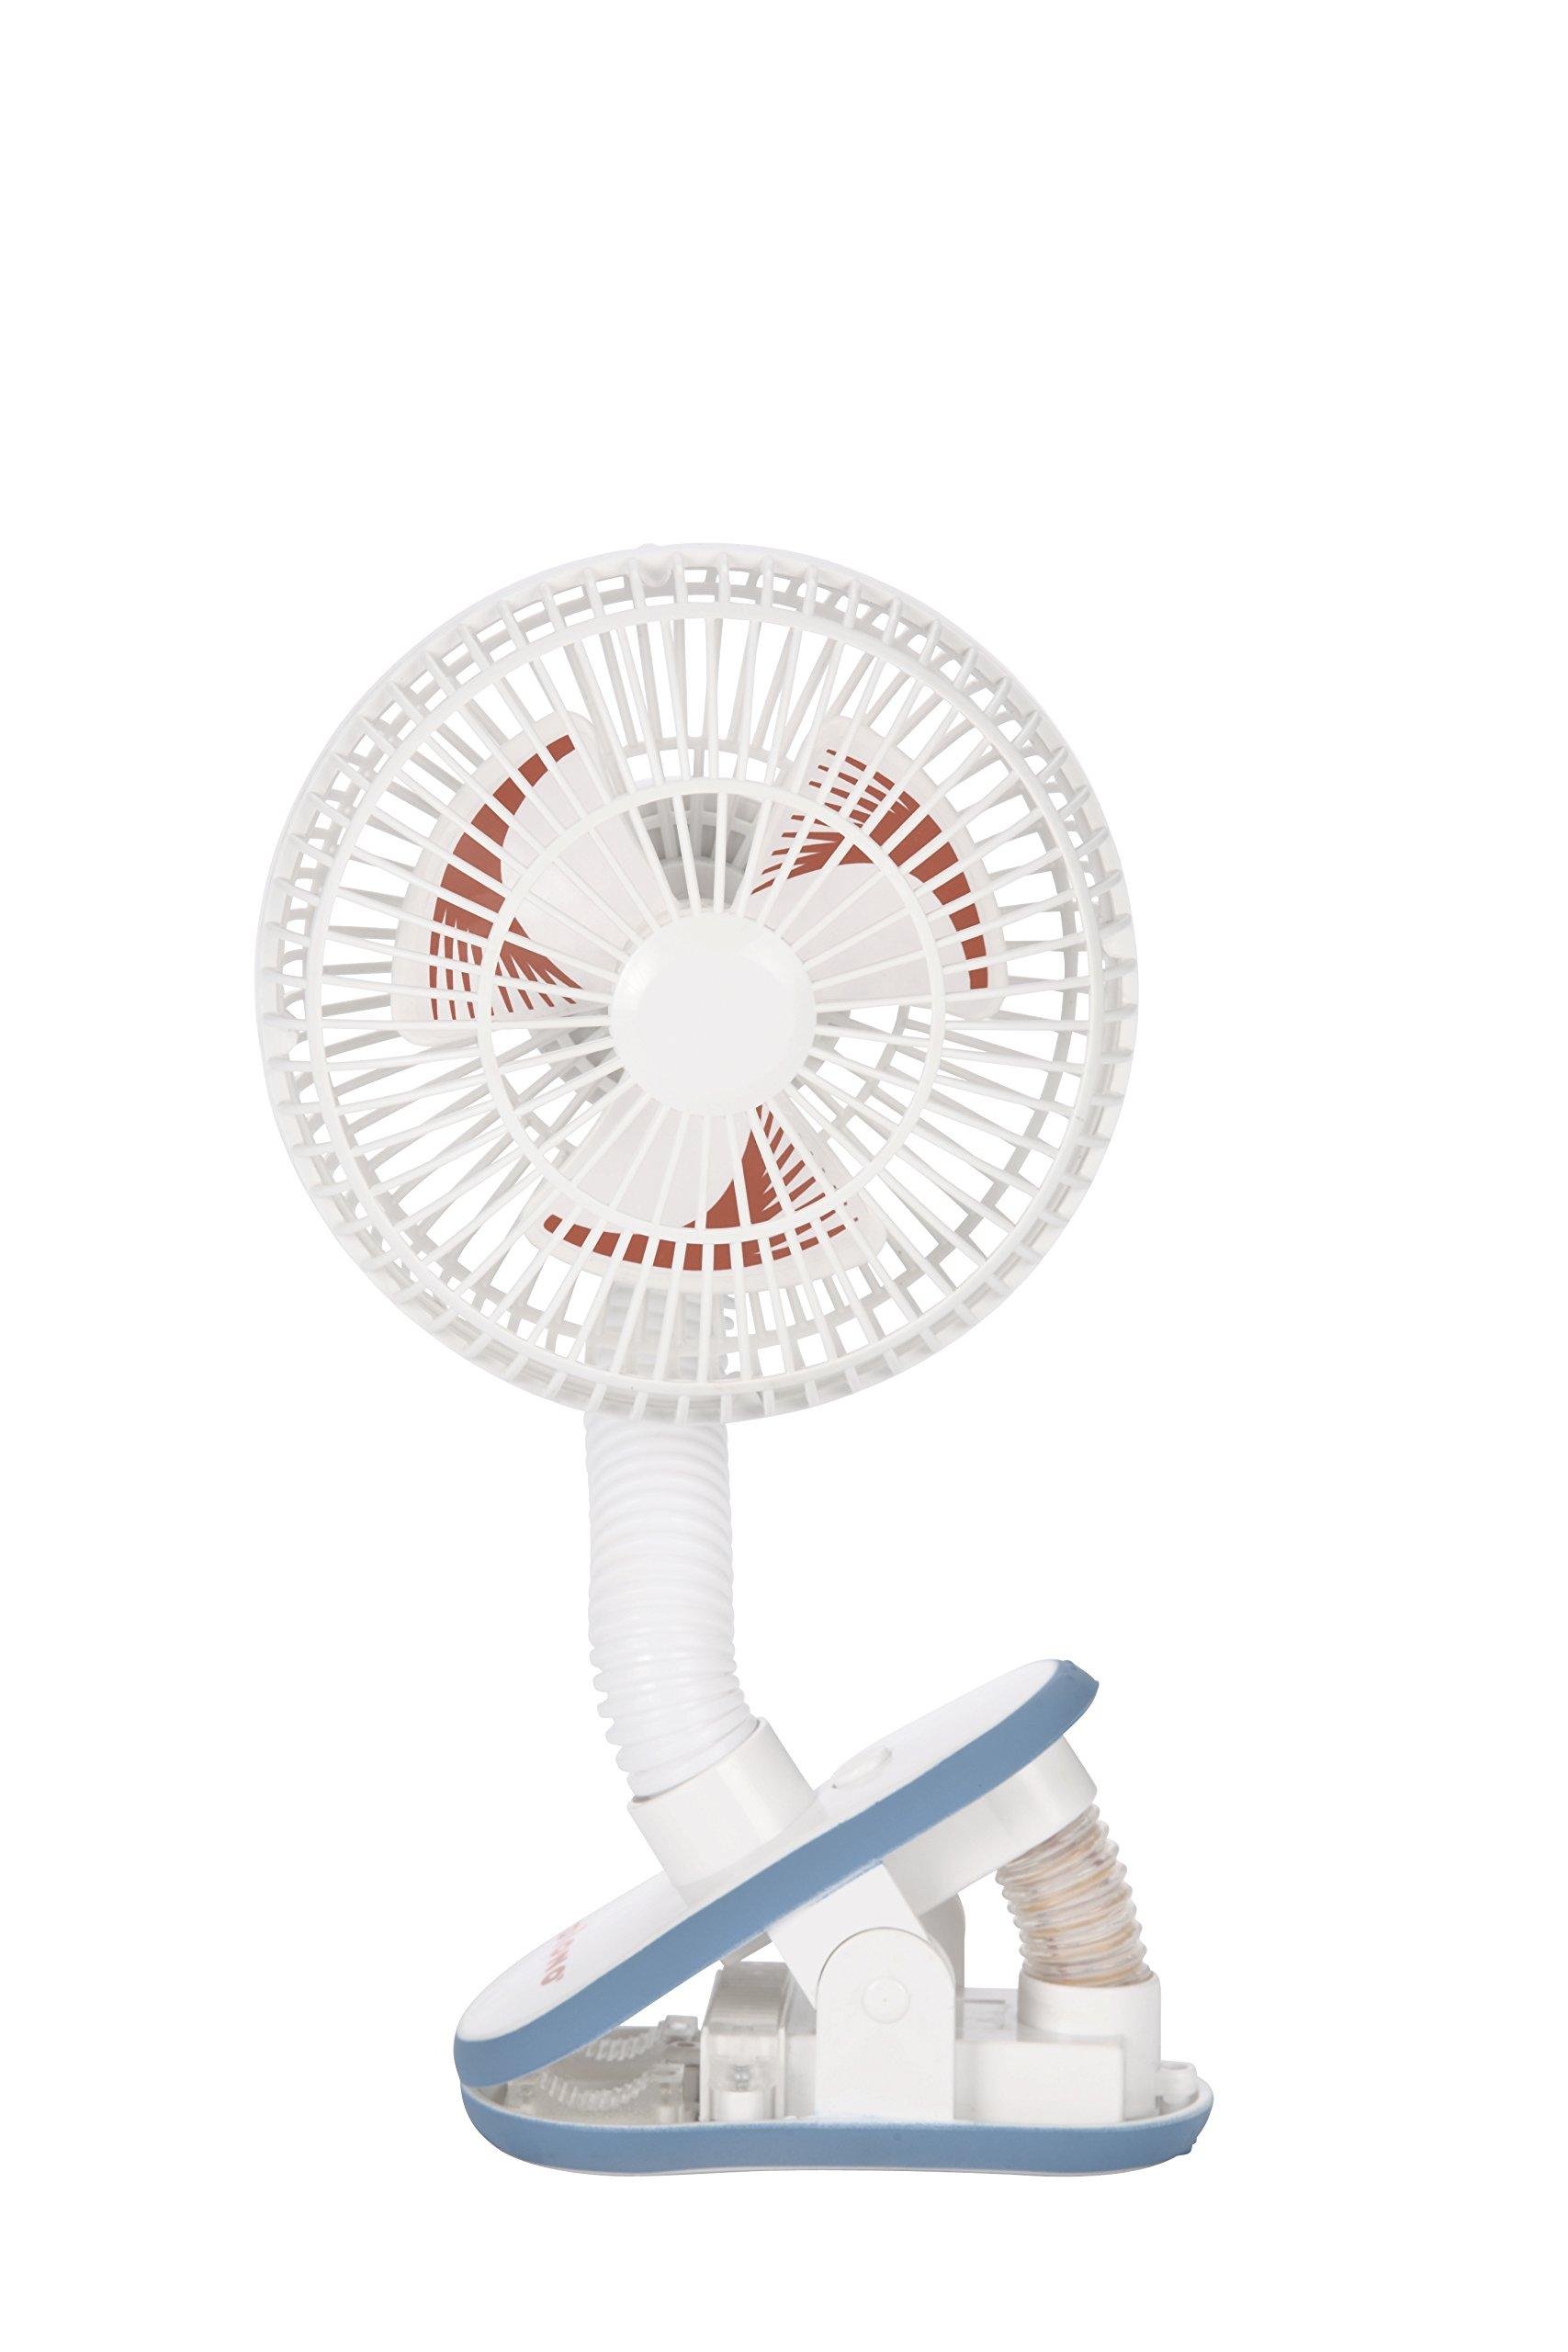 Diono Stroller Fan, Bright,